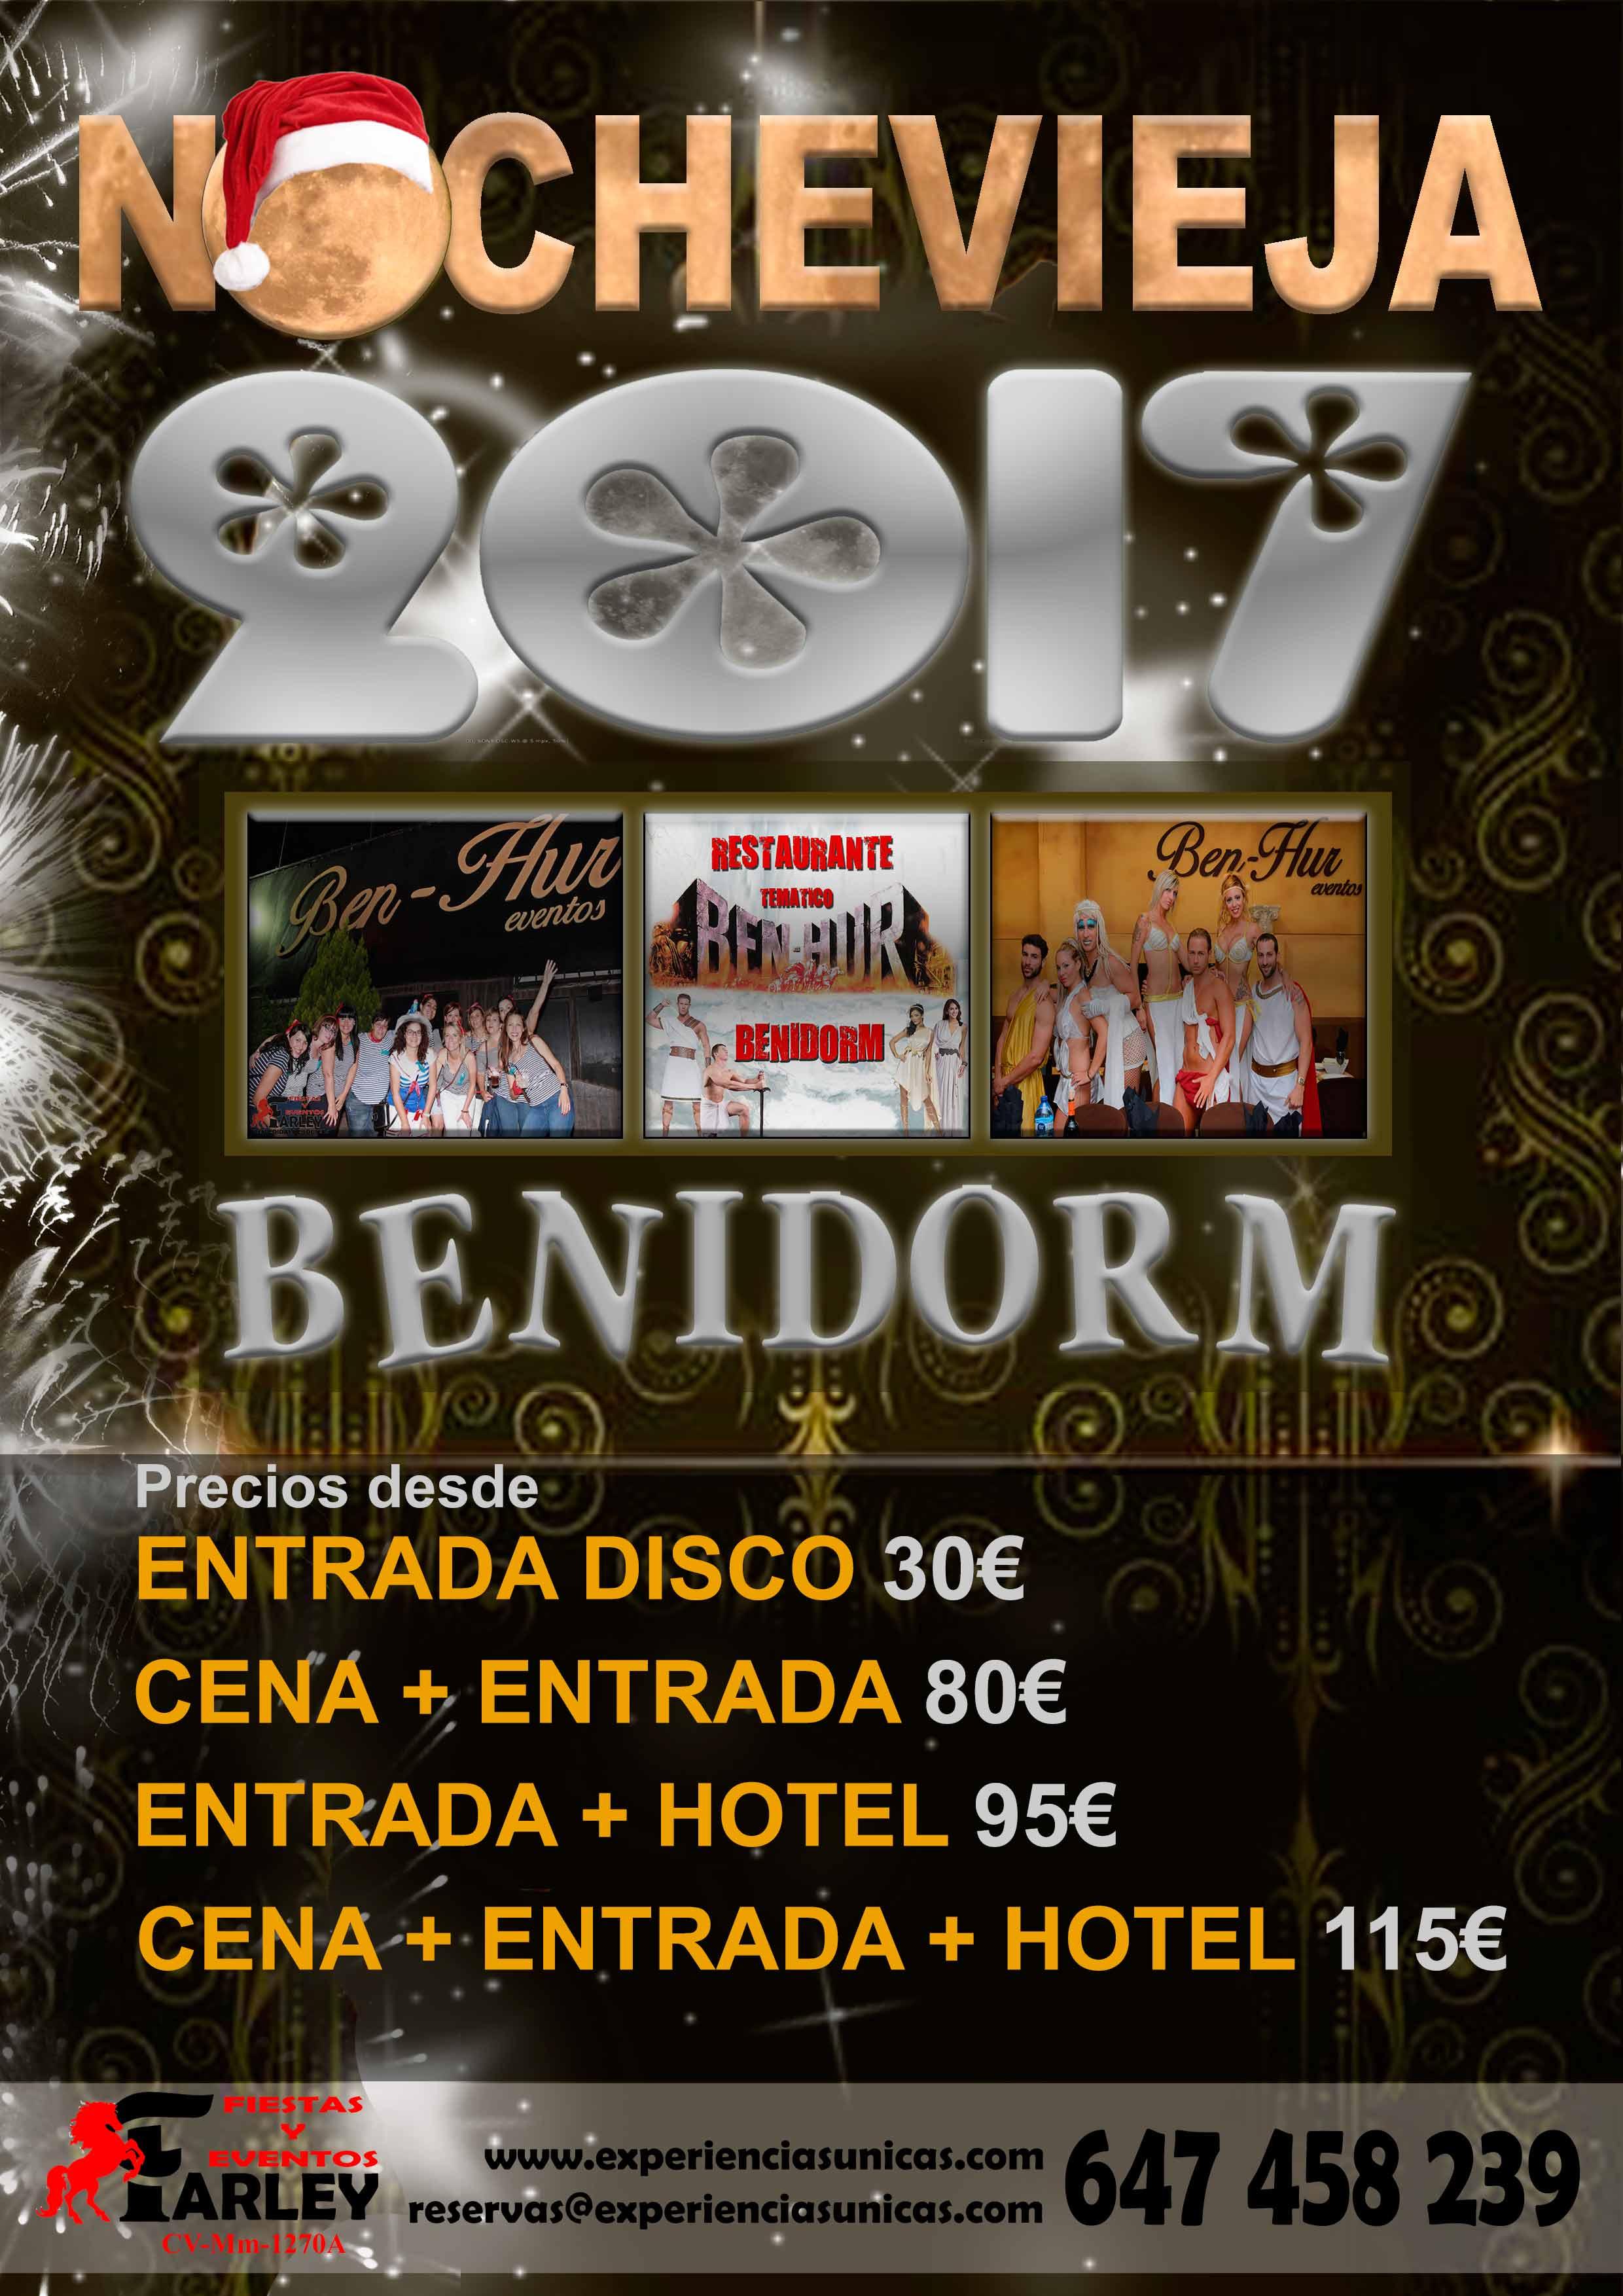 nochevieja benidorm Area Disco 2017